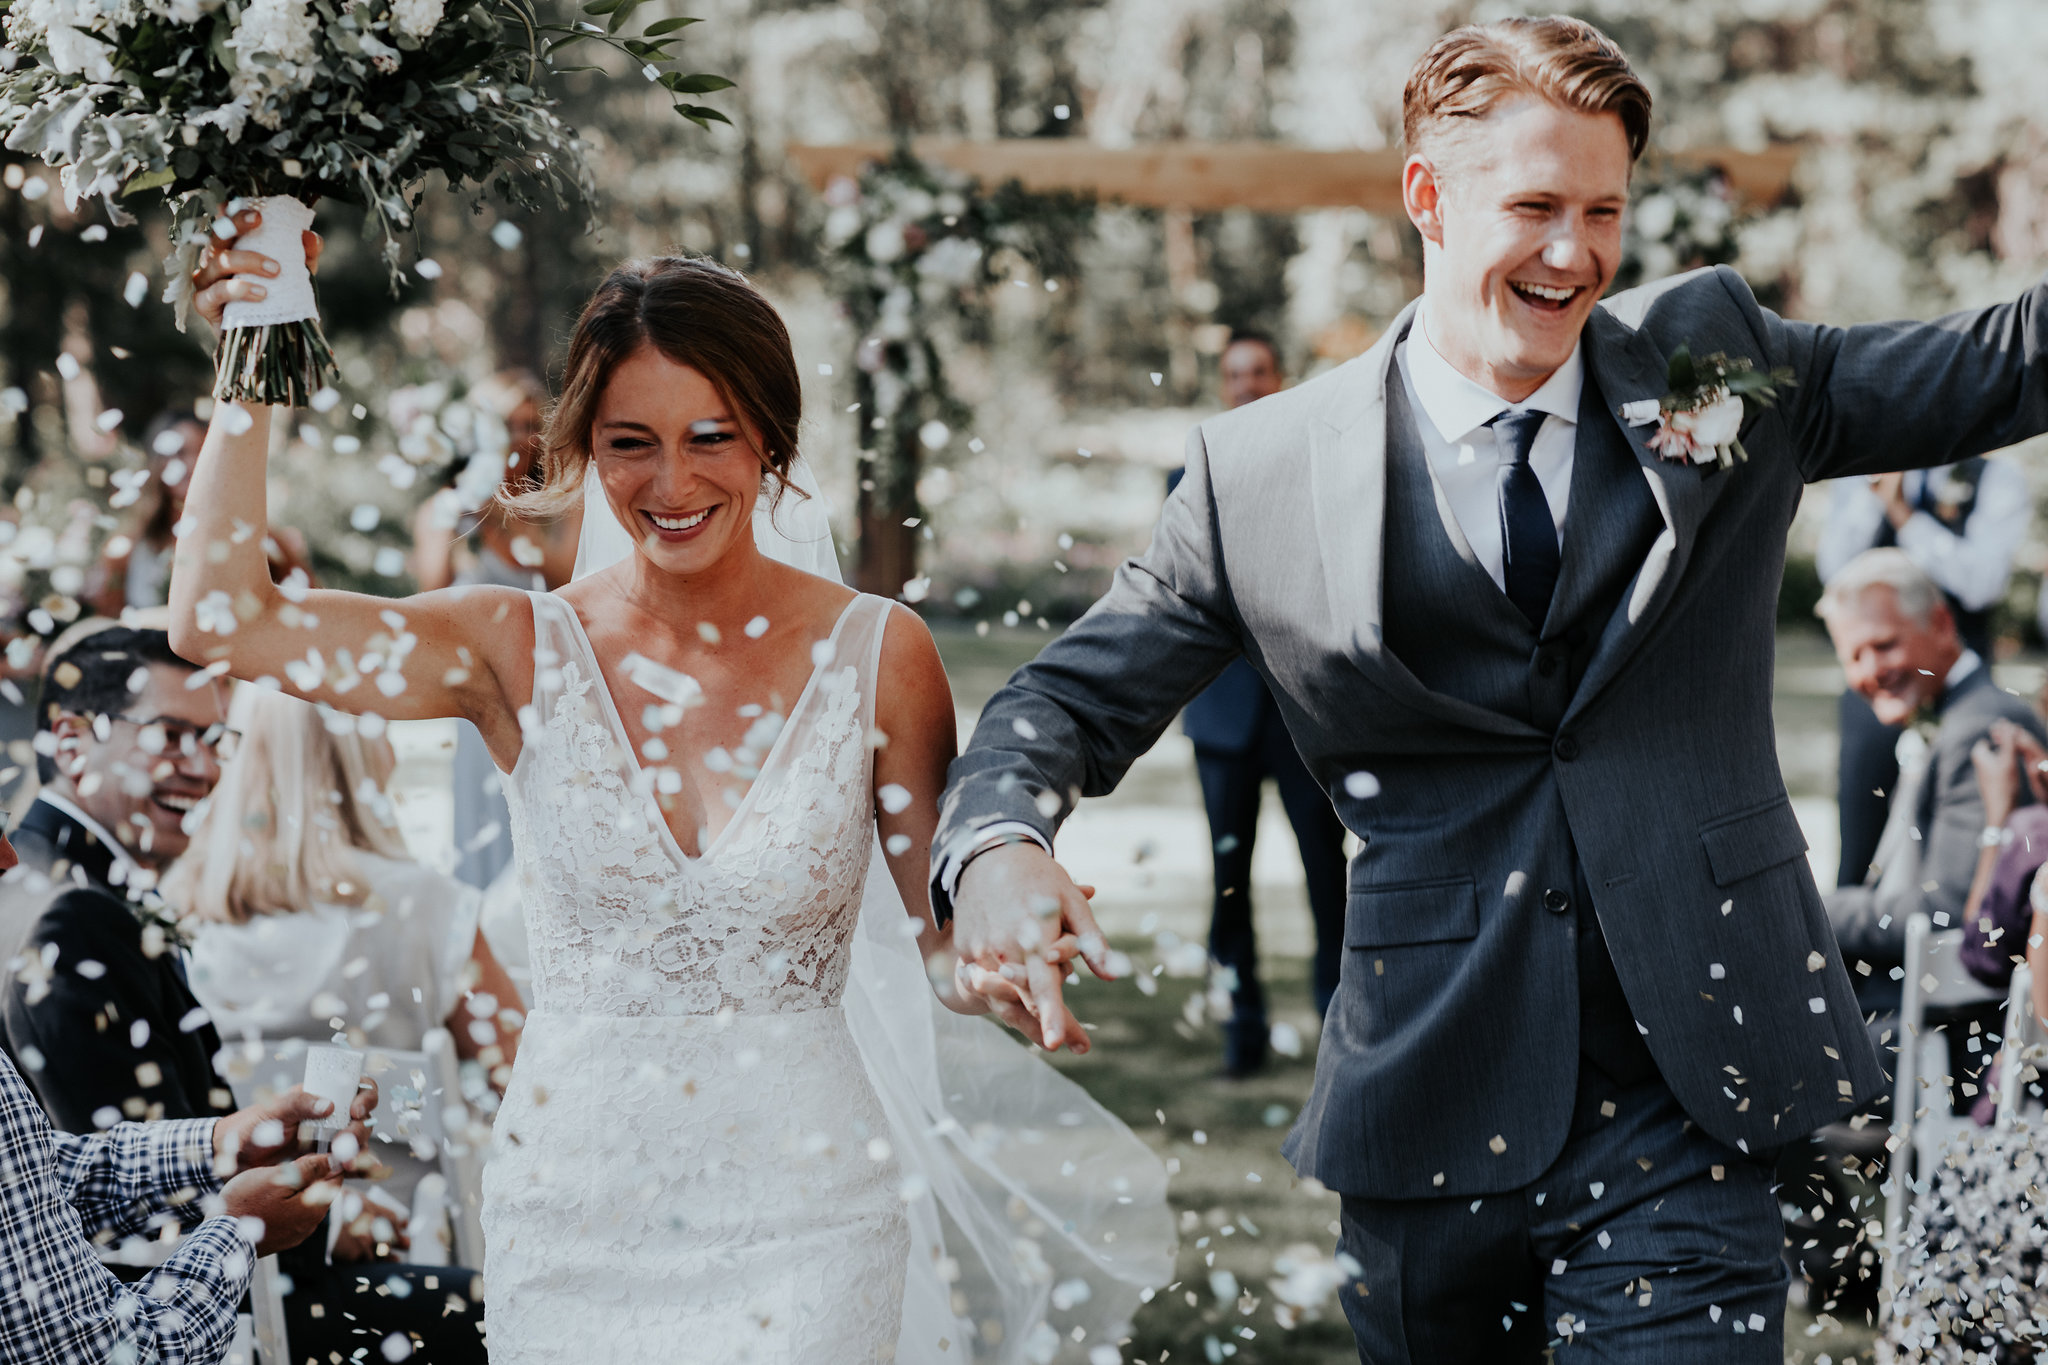 hannah-merritt-photography-porter-wedding-mccloud-guest-house-mt-shasta-california-582.jpg